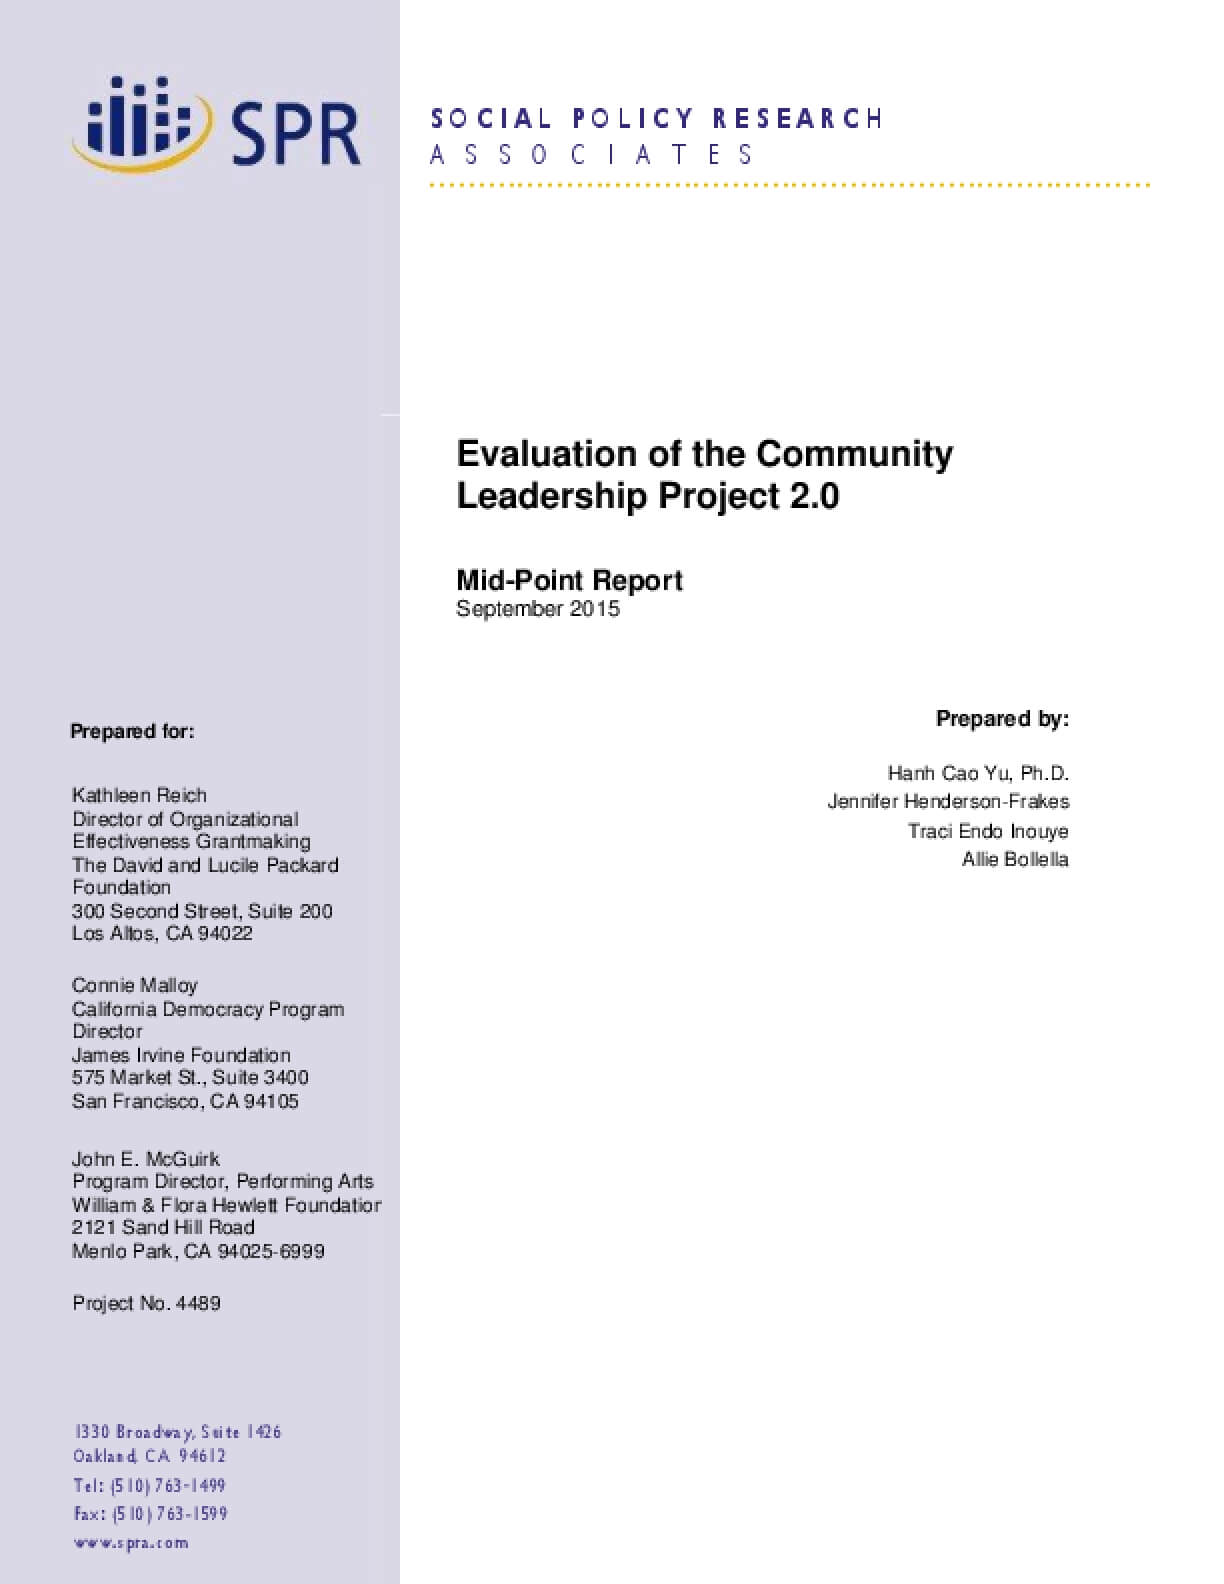 A research on community organization